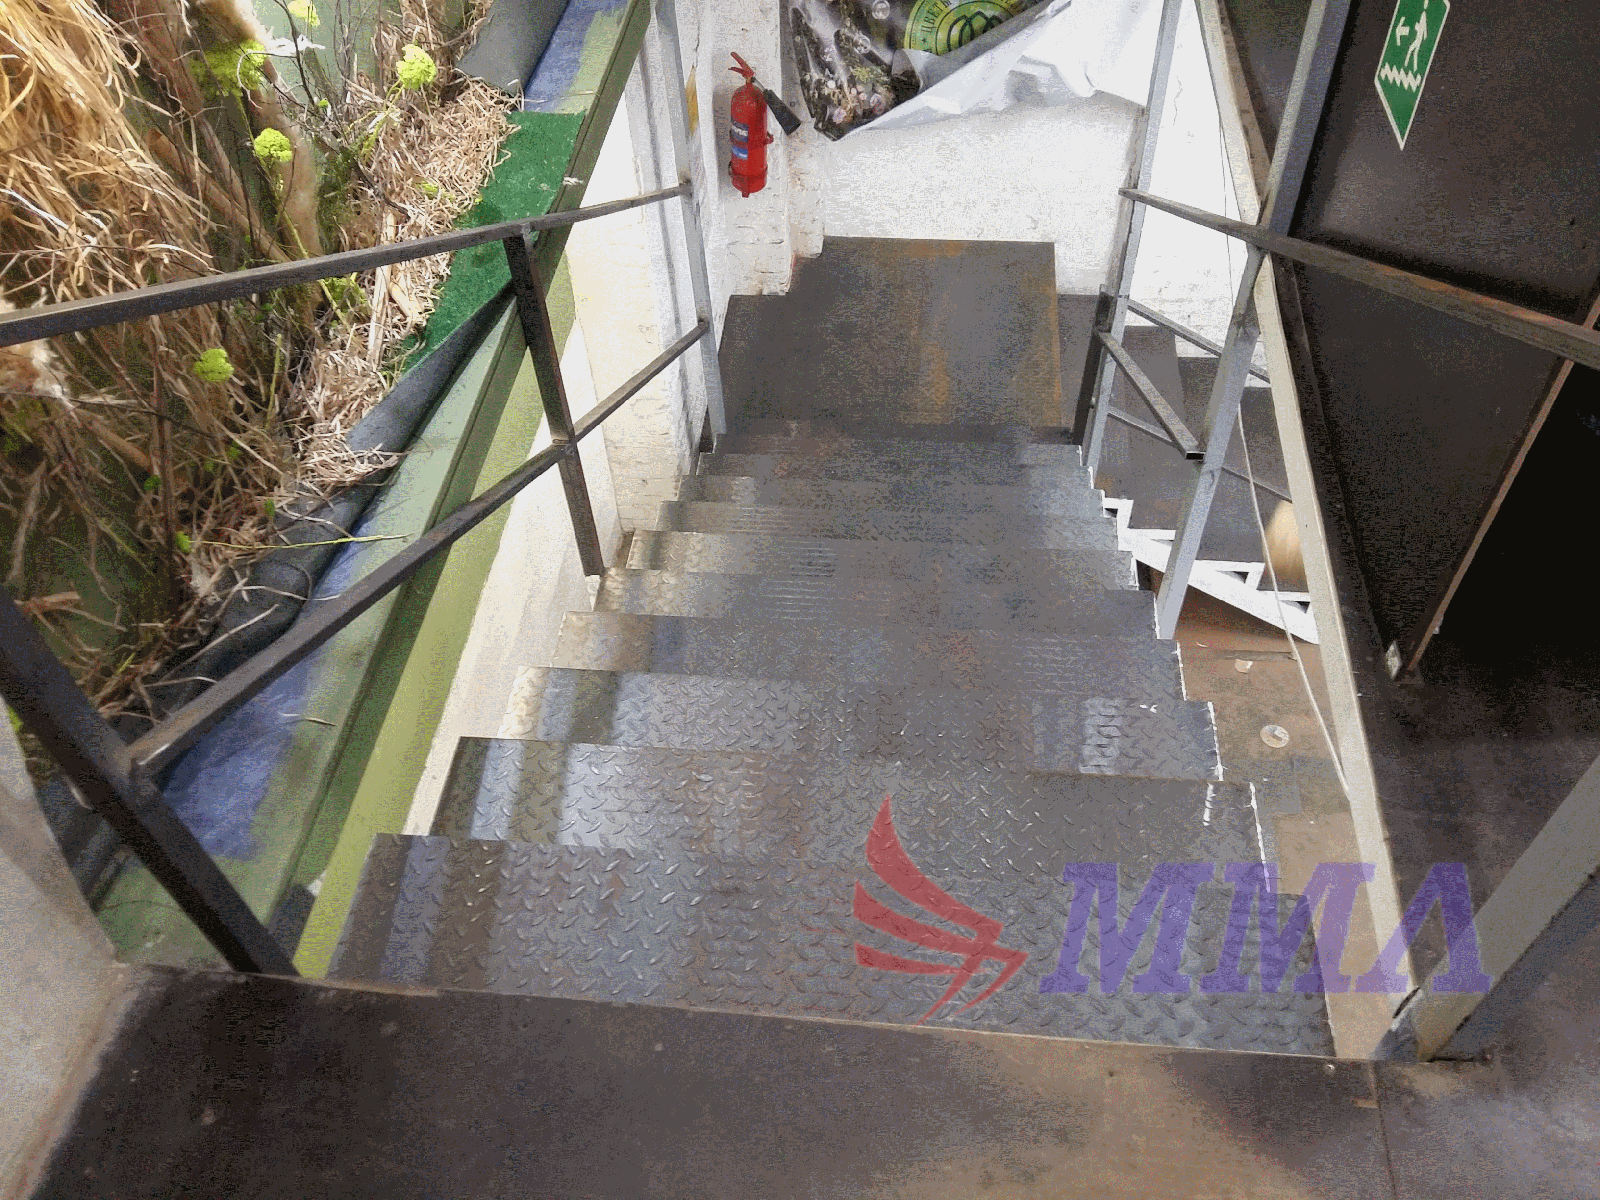 пожарная лестница, металлокаркас, каркас, лестница, пожарная лестница, металлокаркас, каркас, лестница,